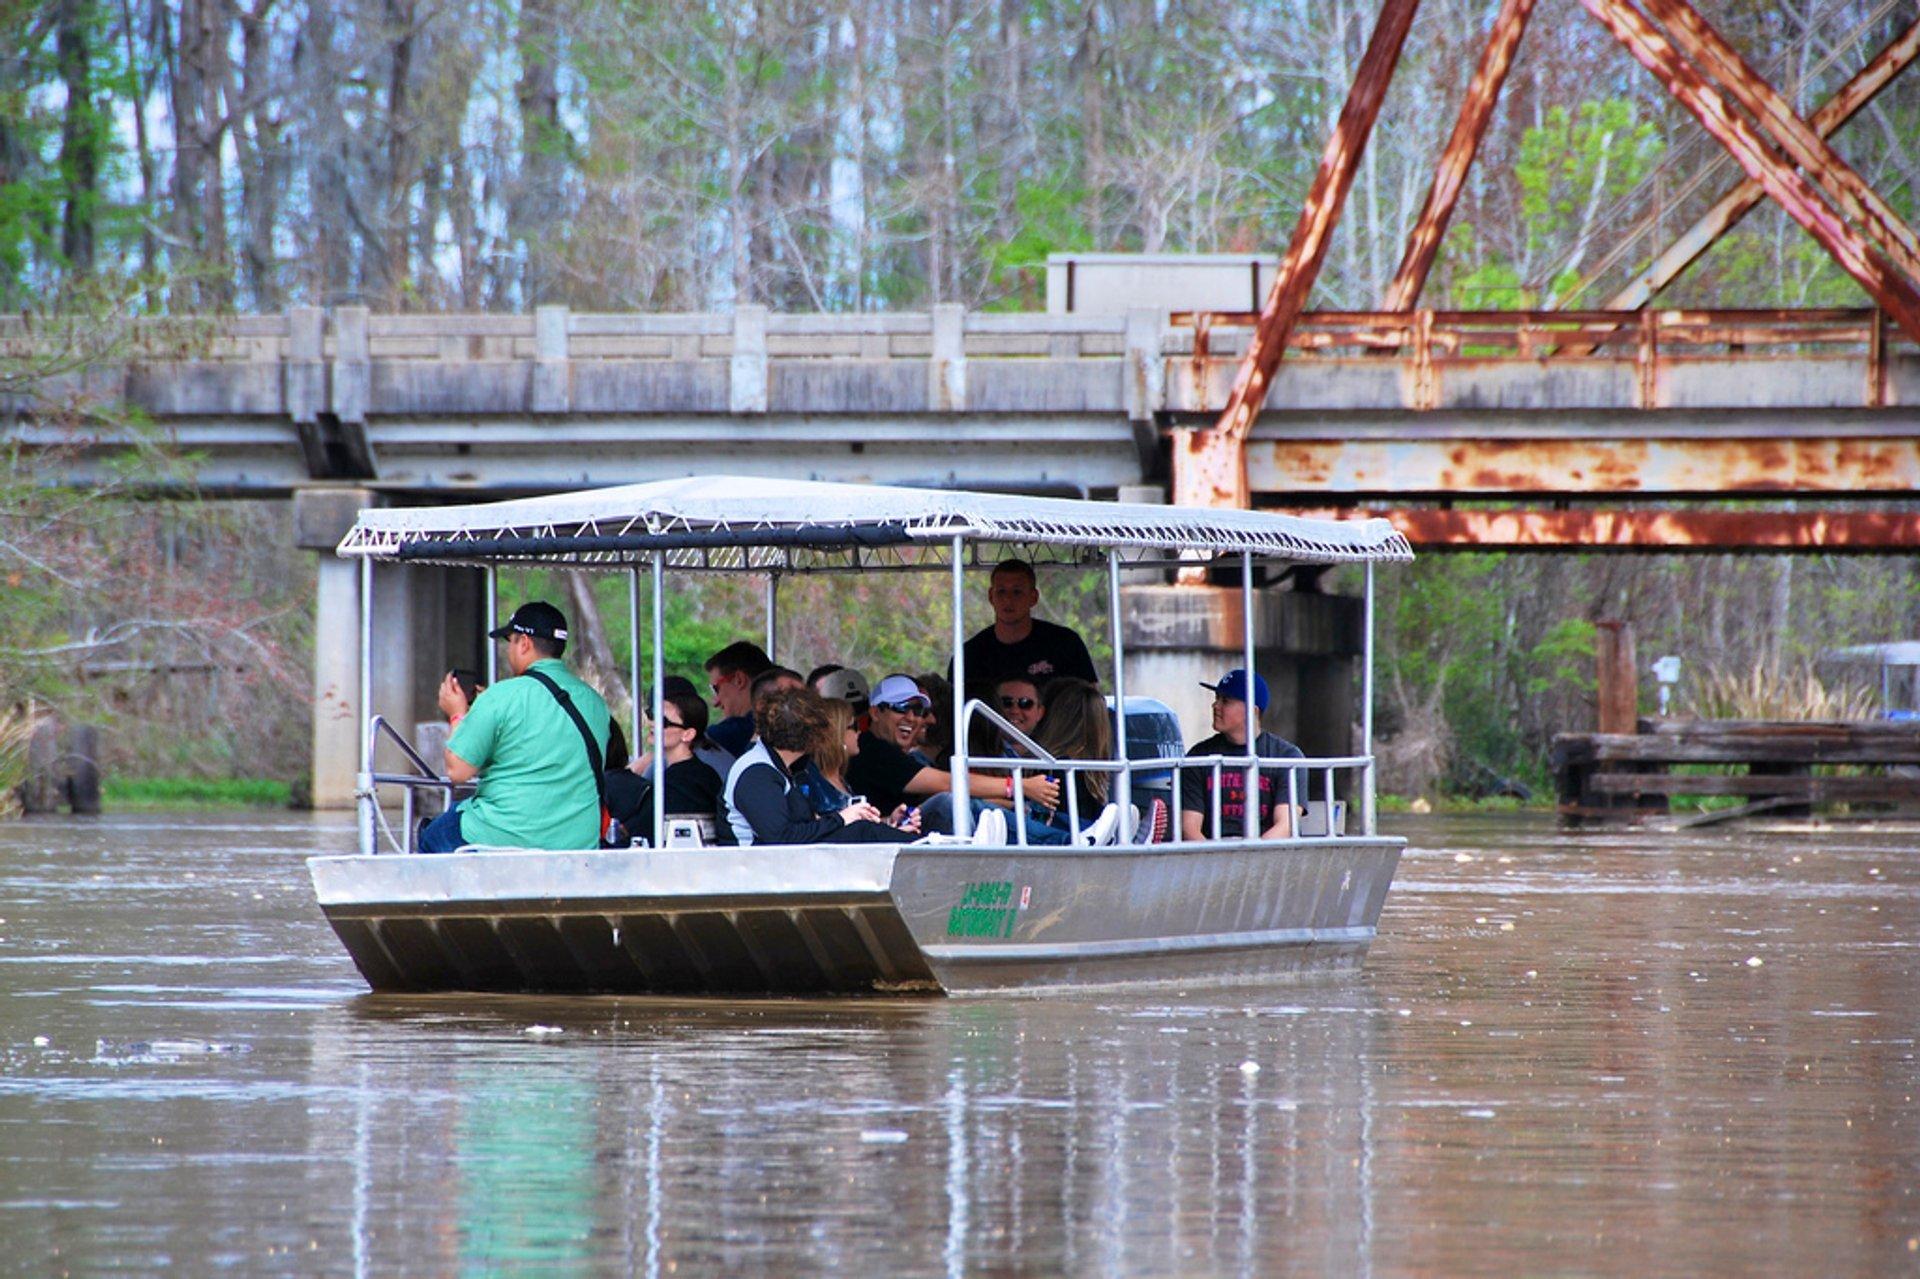 Swamp Tours in New Orleans - Best Season